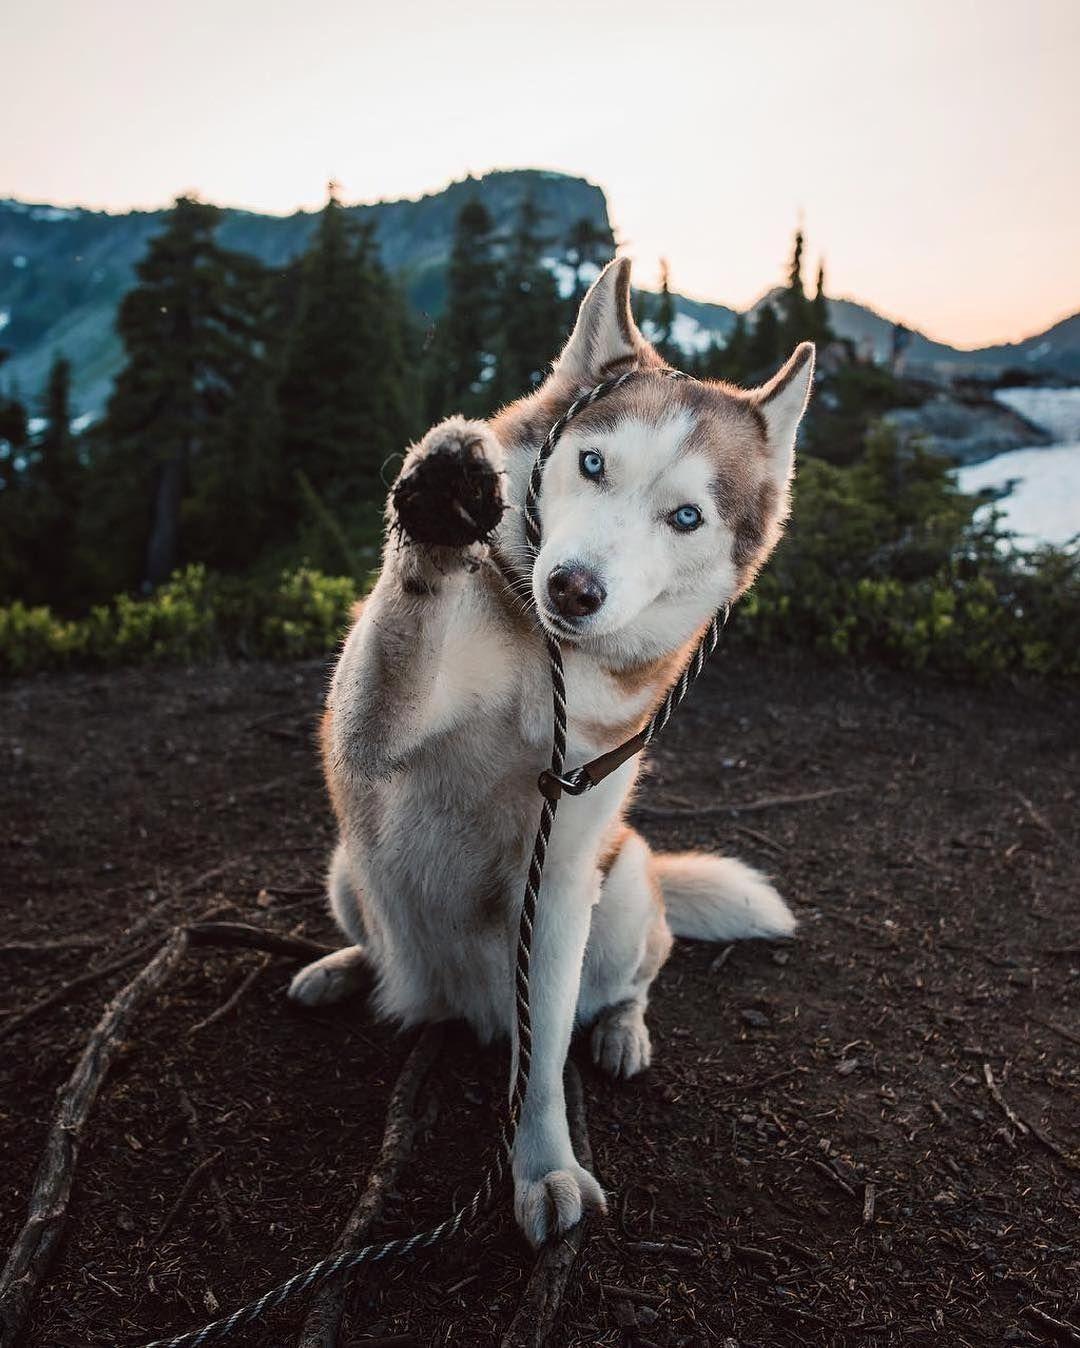 siberianhusky Hunde, Husky hund, Husky welpen